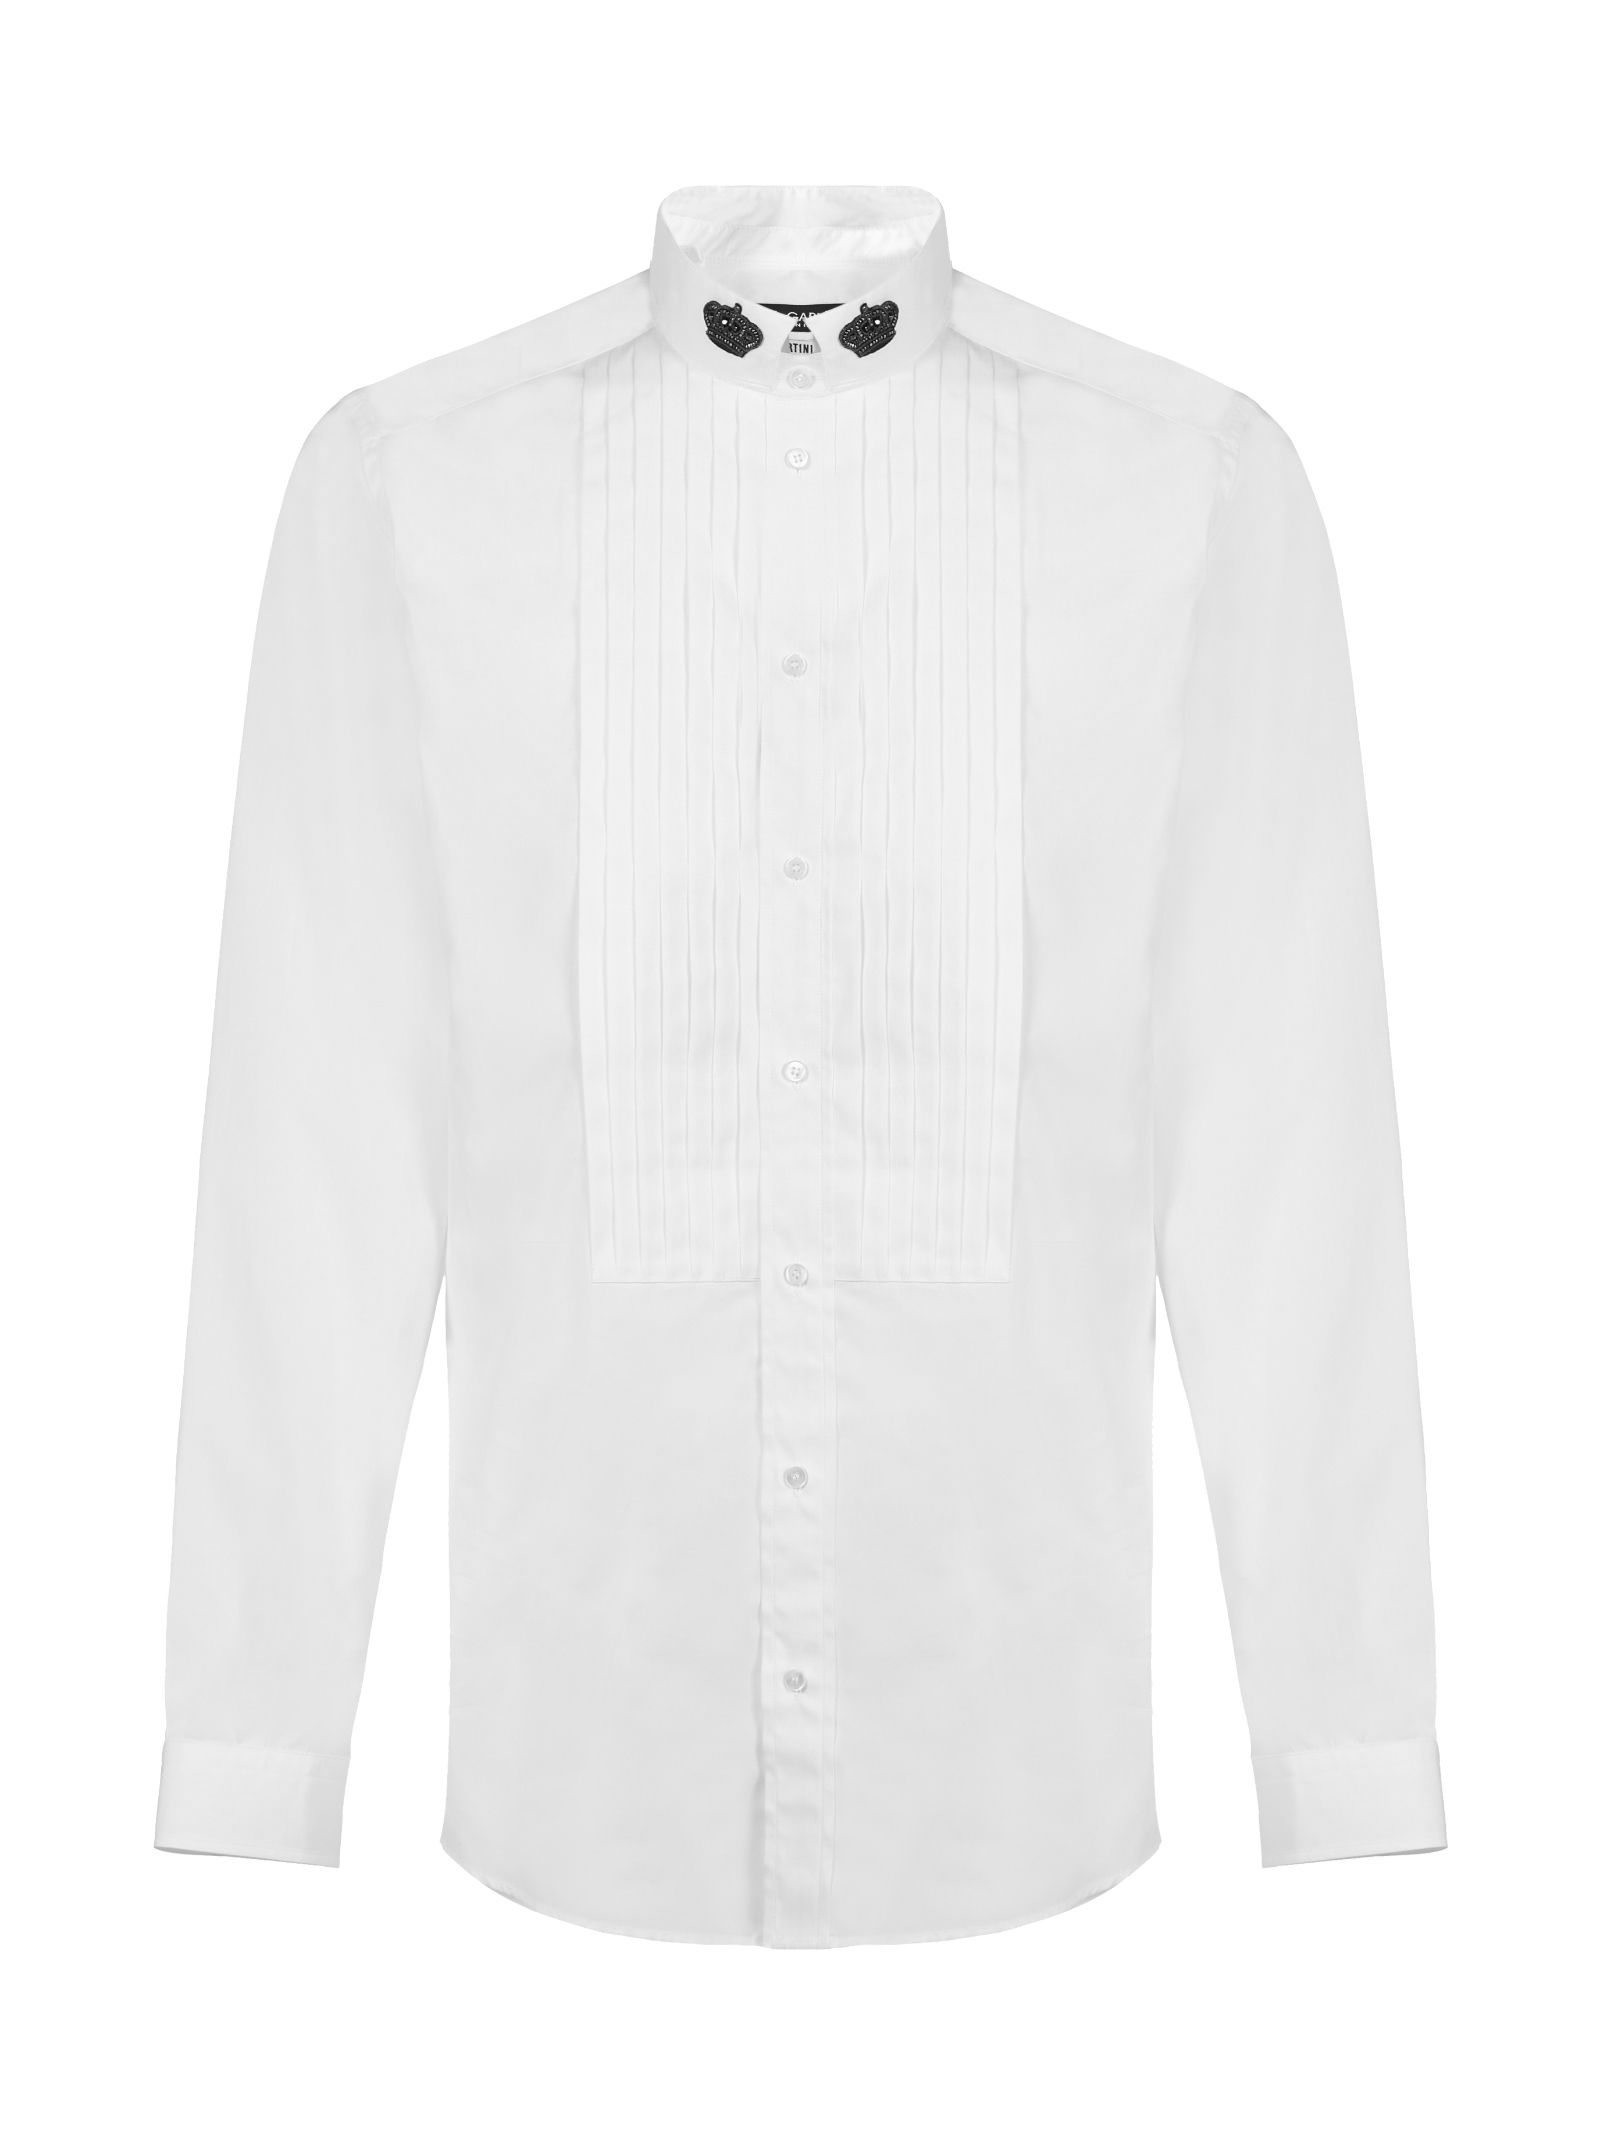 Dolce & Gabbana Tuxedo Pleated Detail Shirt